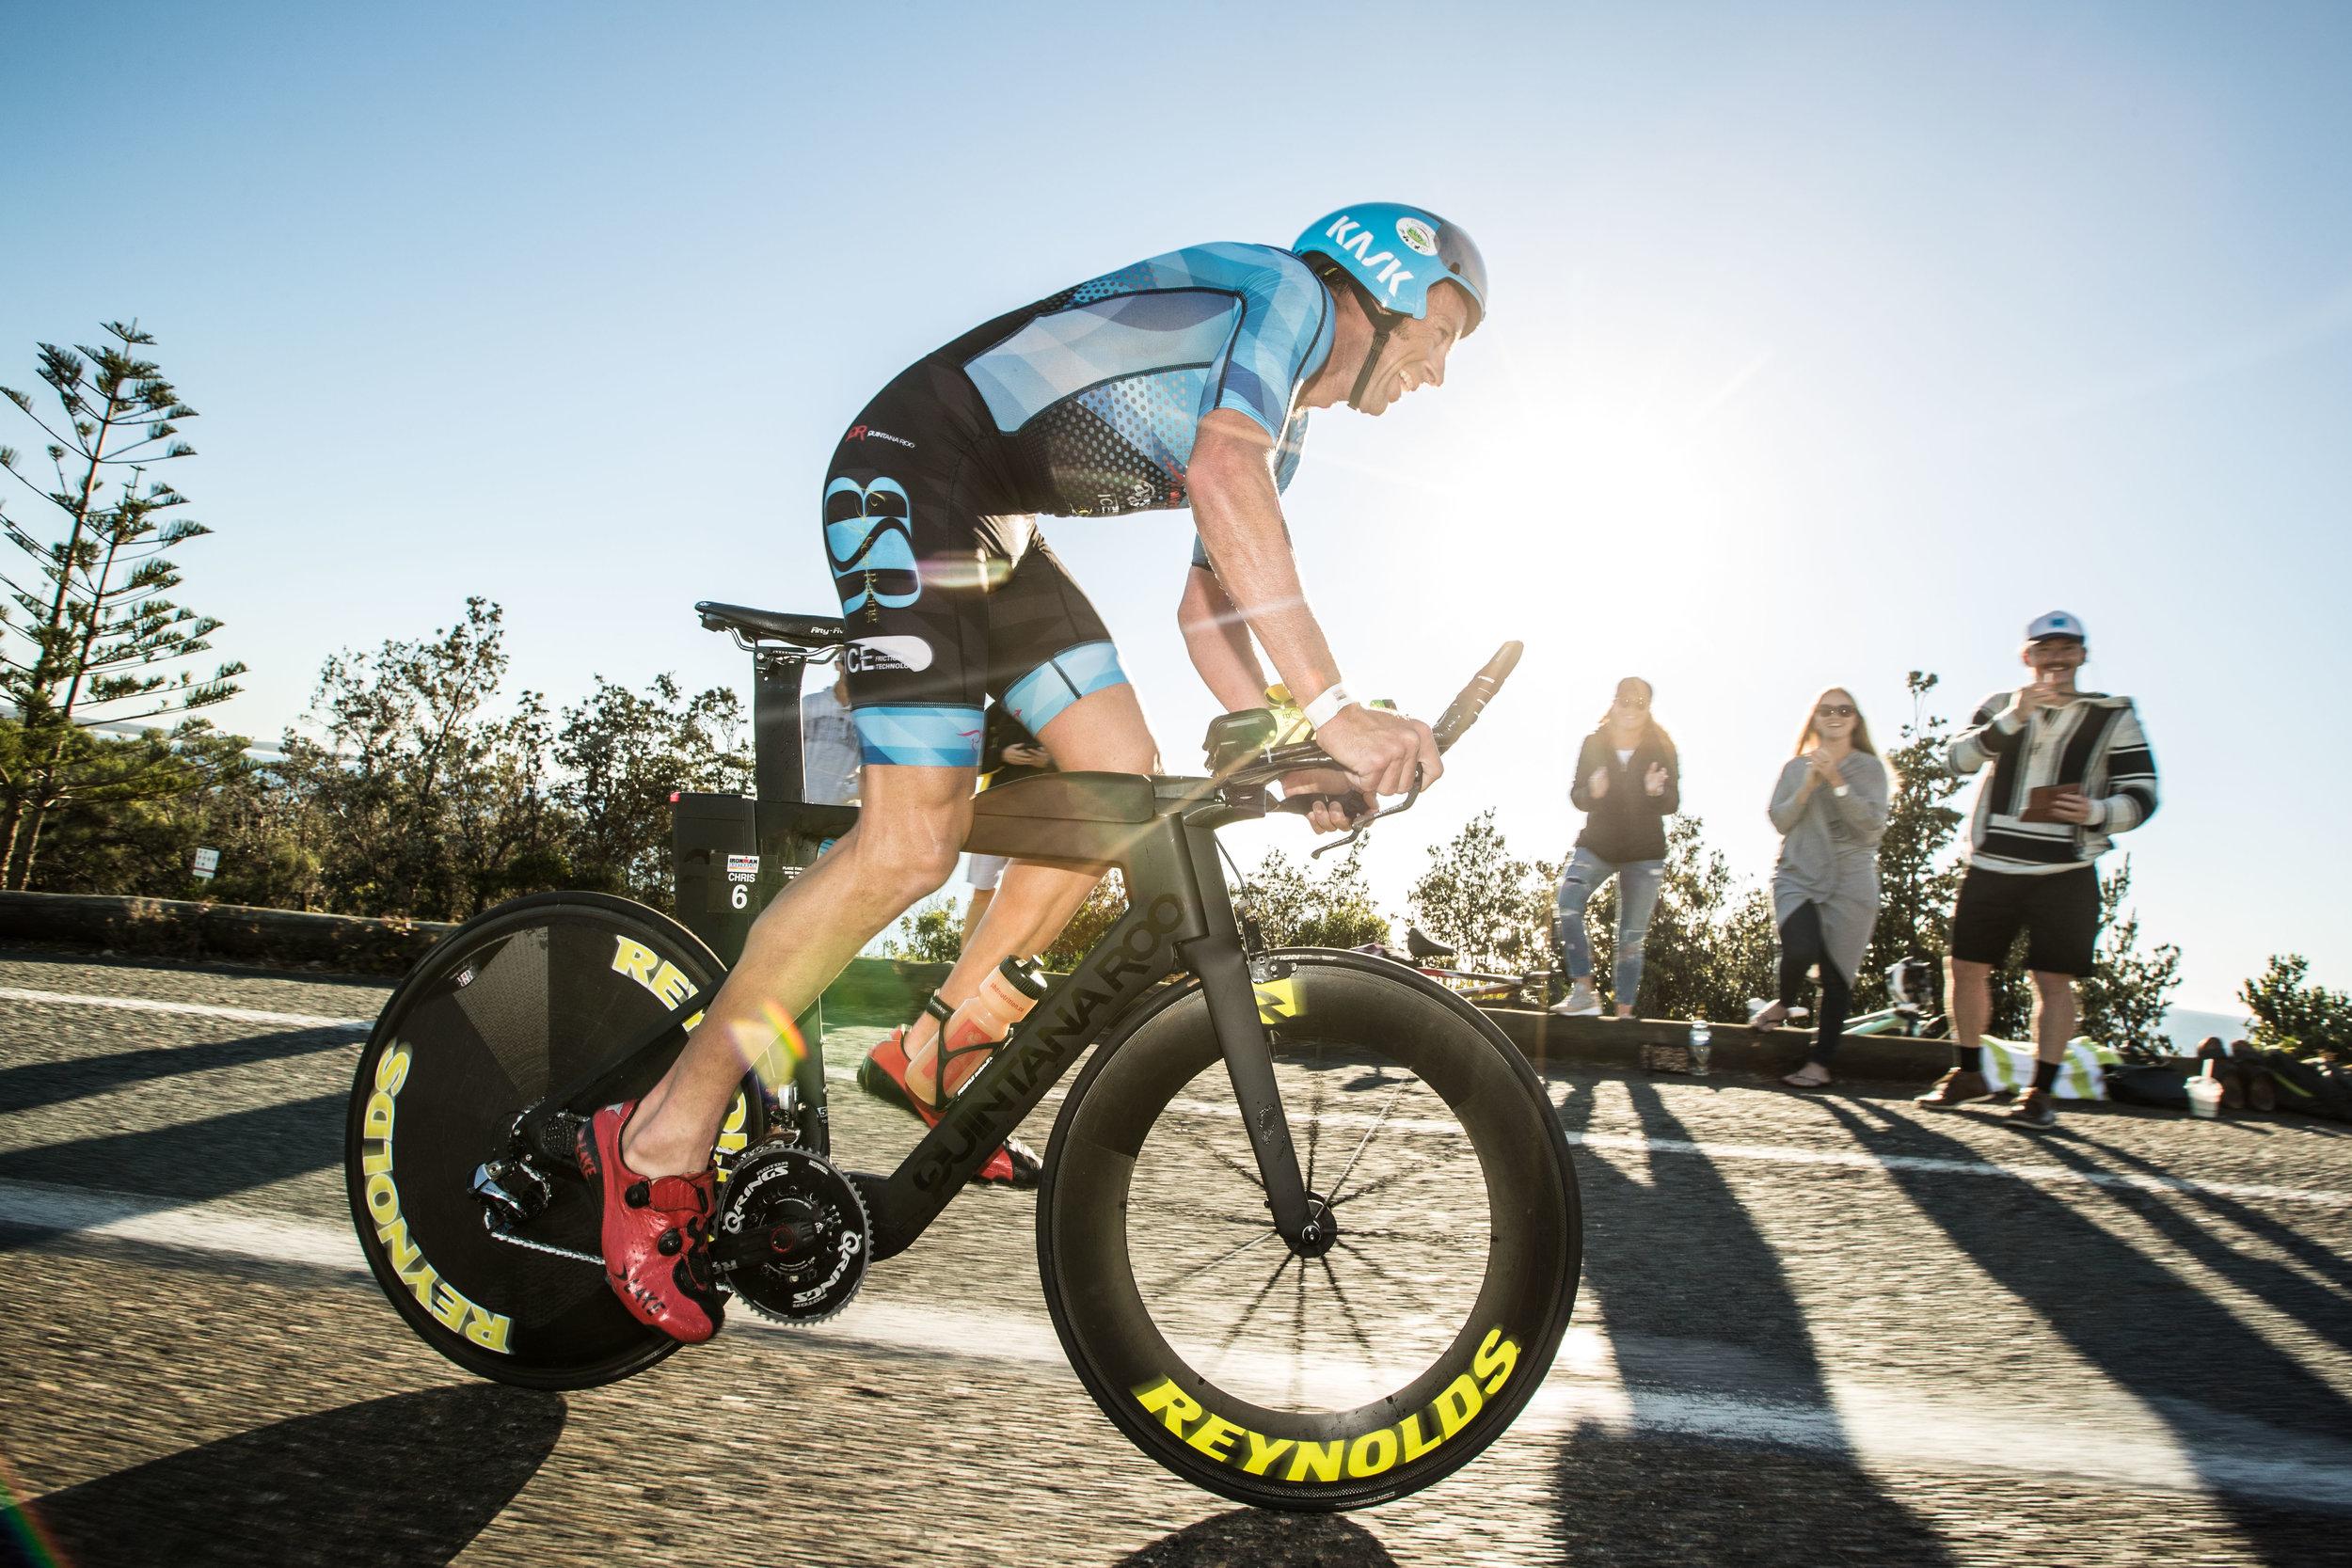 Chris McDonald starts the 180k bike leg...